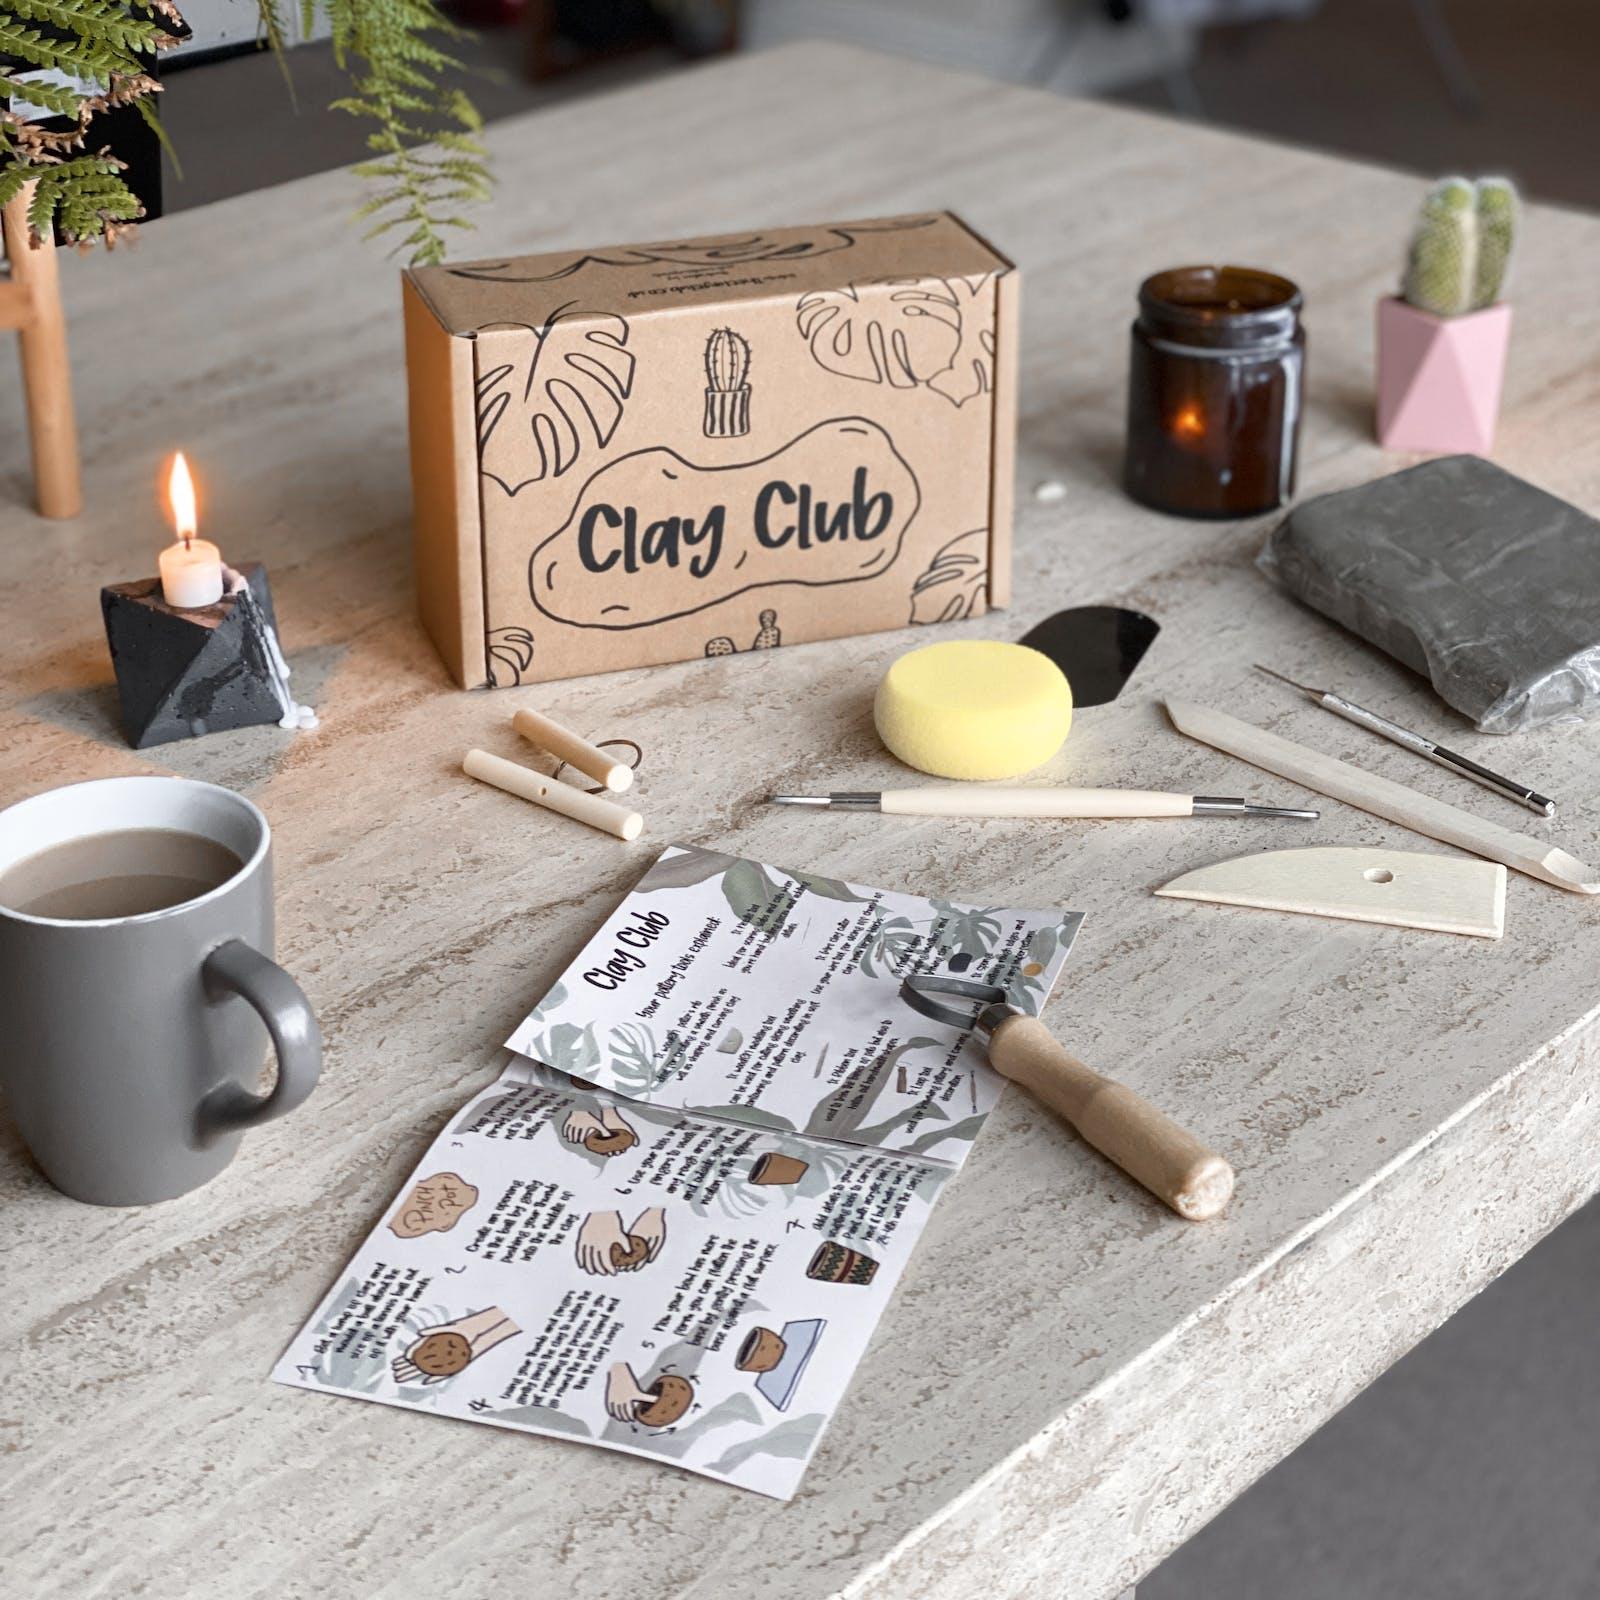 Clay Club DIY pottery set